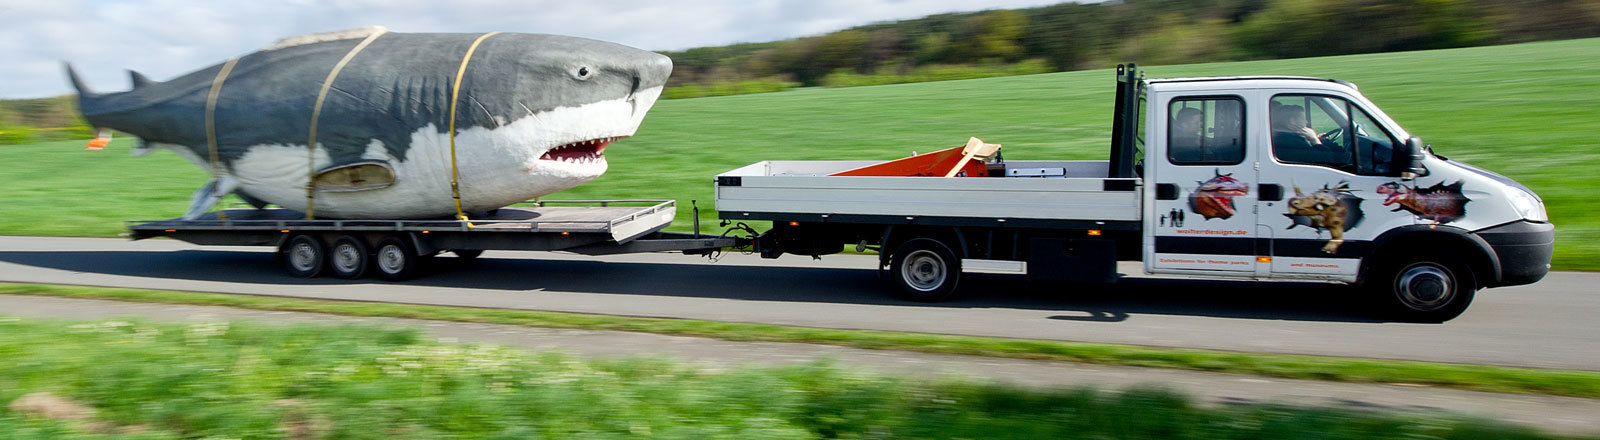 Dinopark bekommt Riesen-Hai